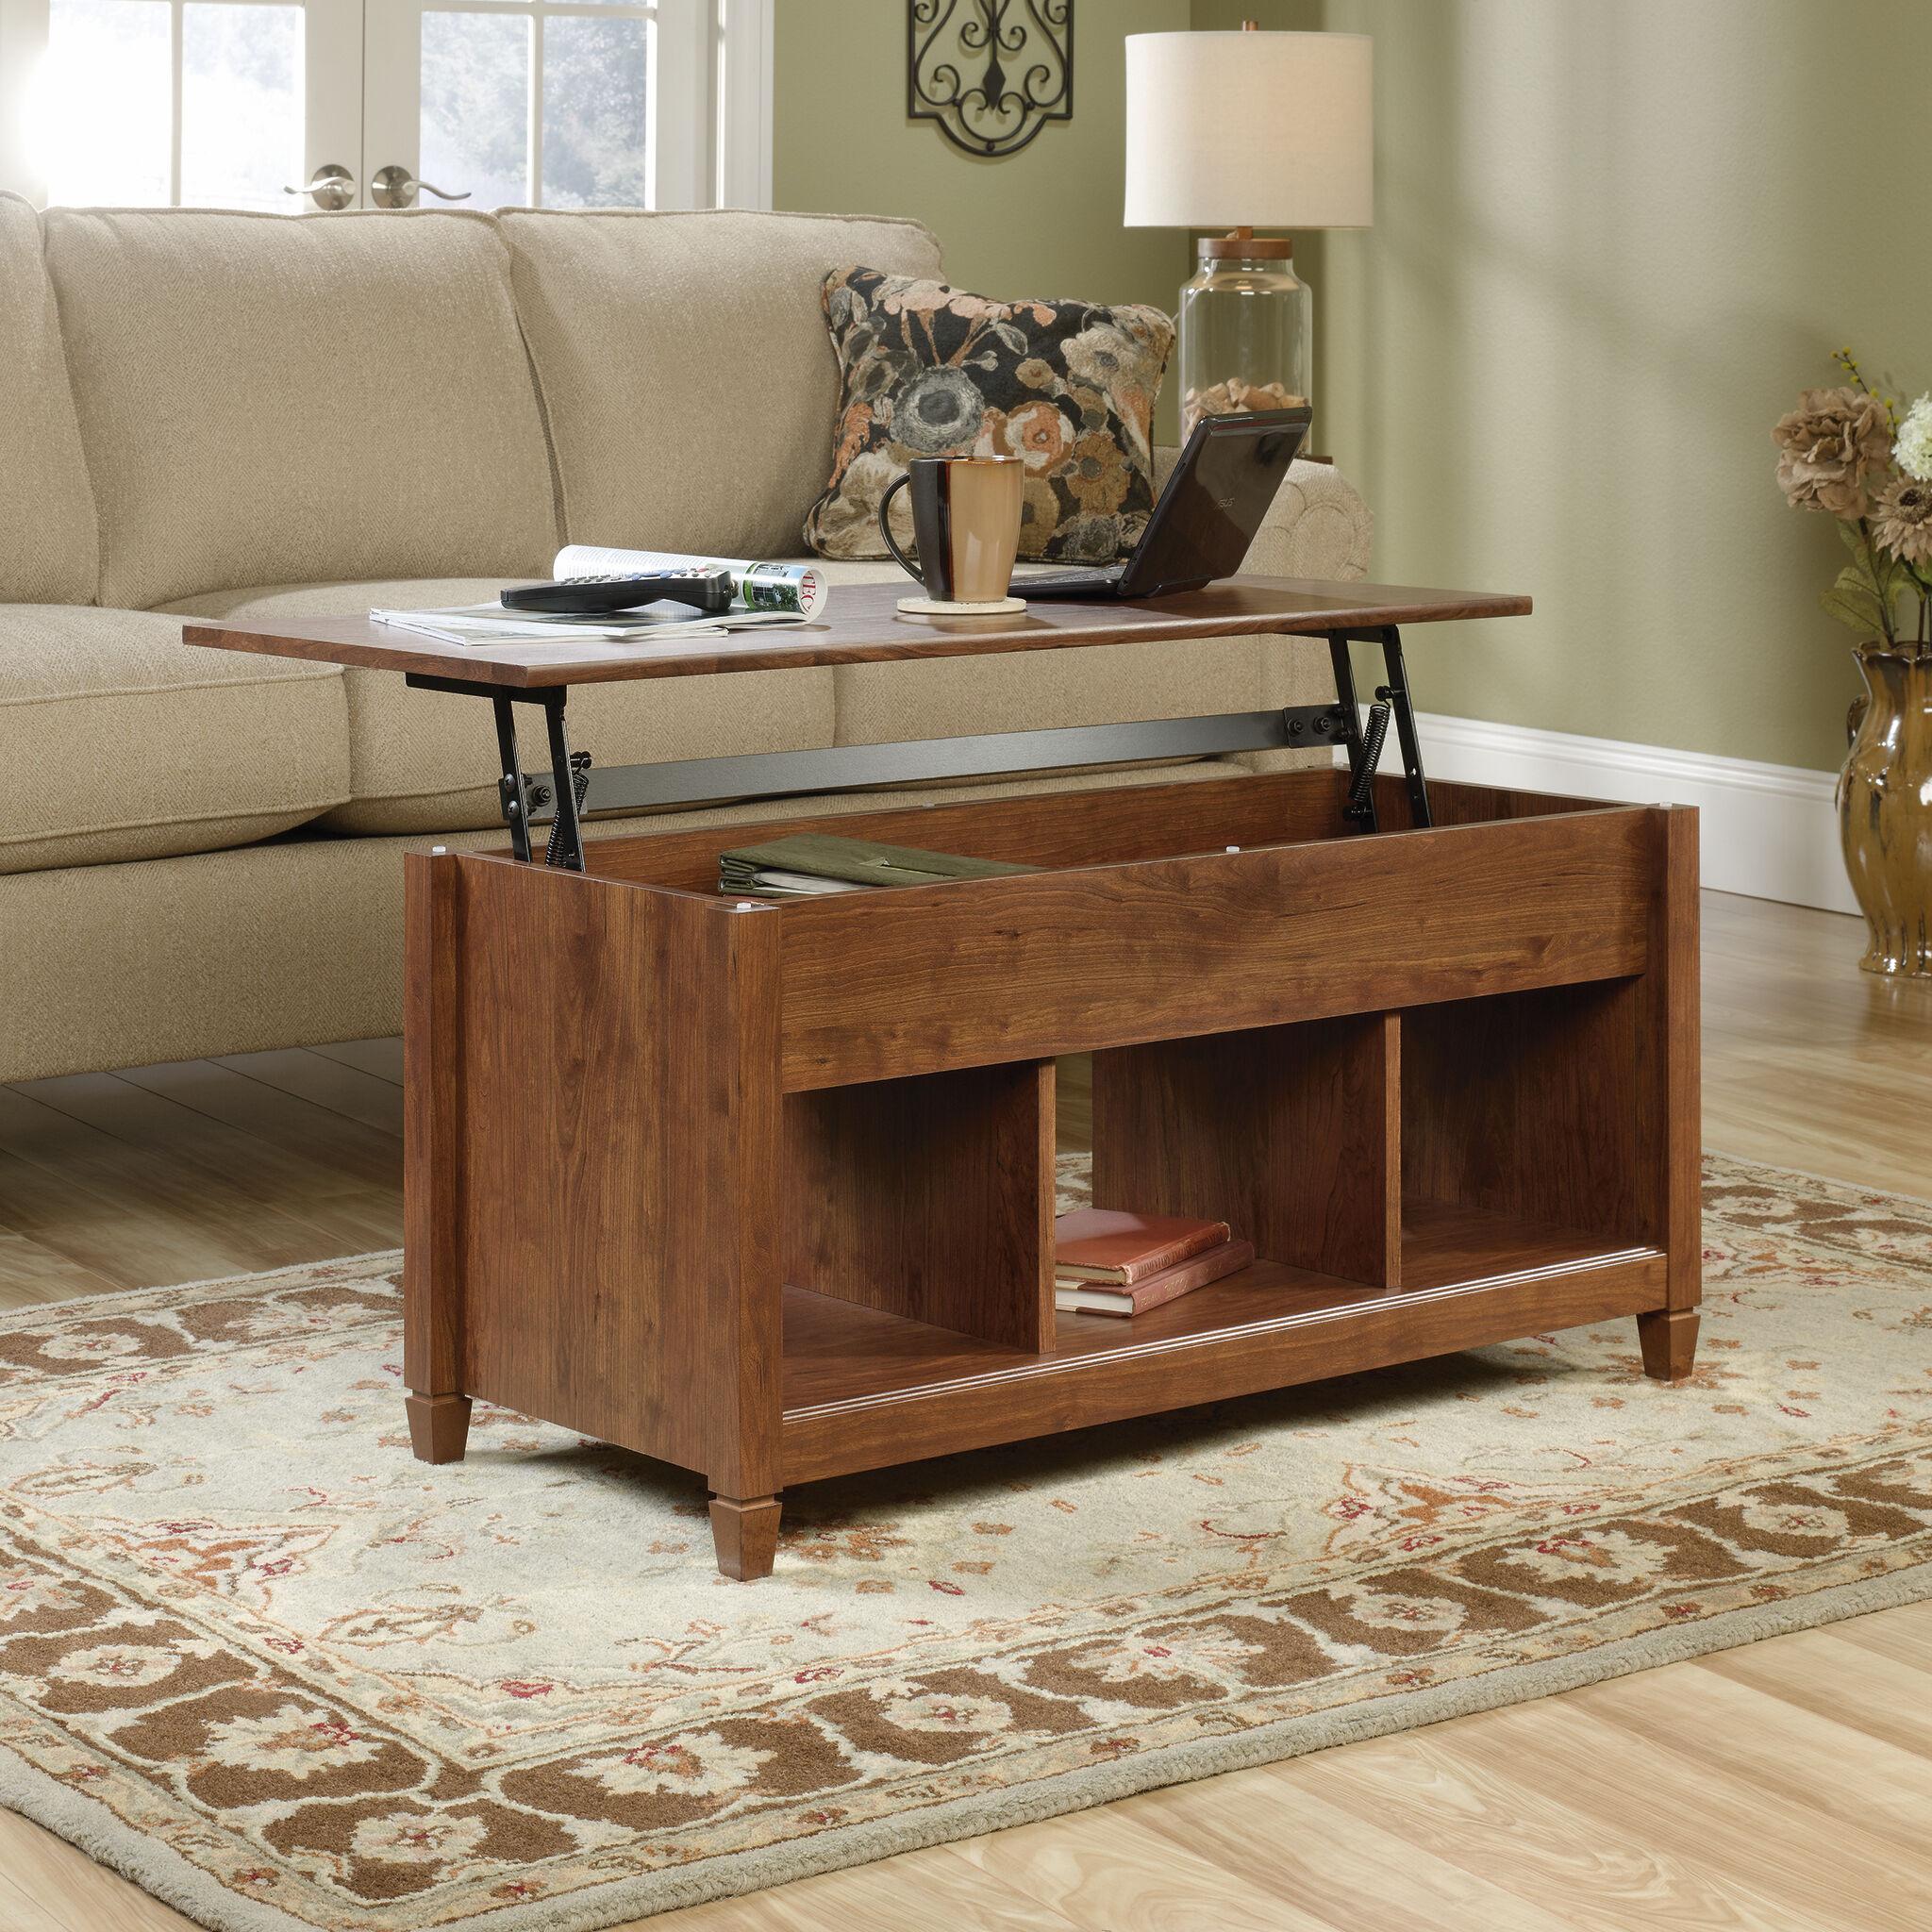 Rectangular Lift Top Contemporary Coffee Tableu0026nbsp;in Auburn Cherry